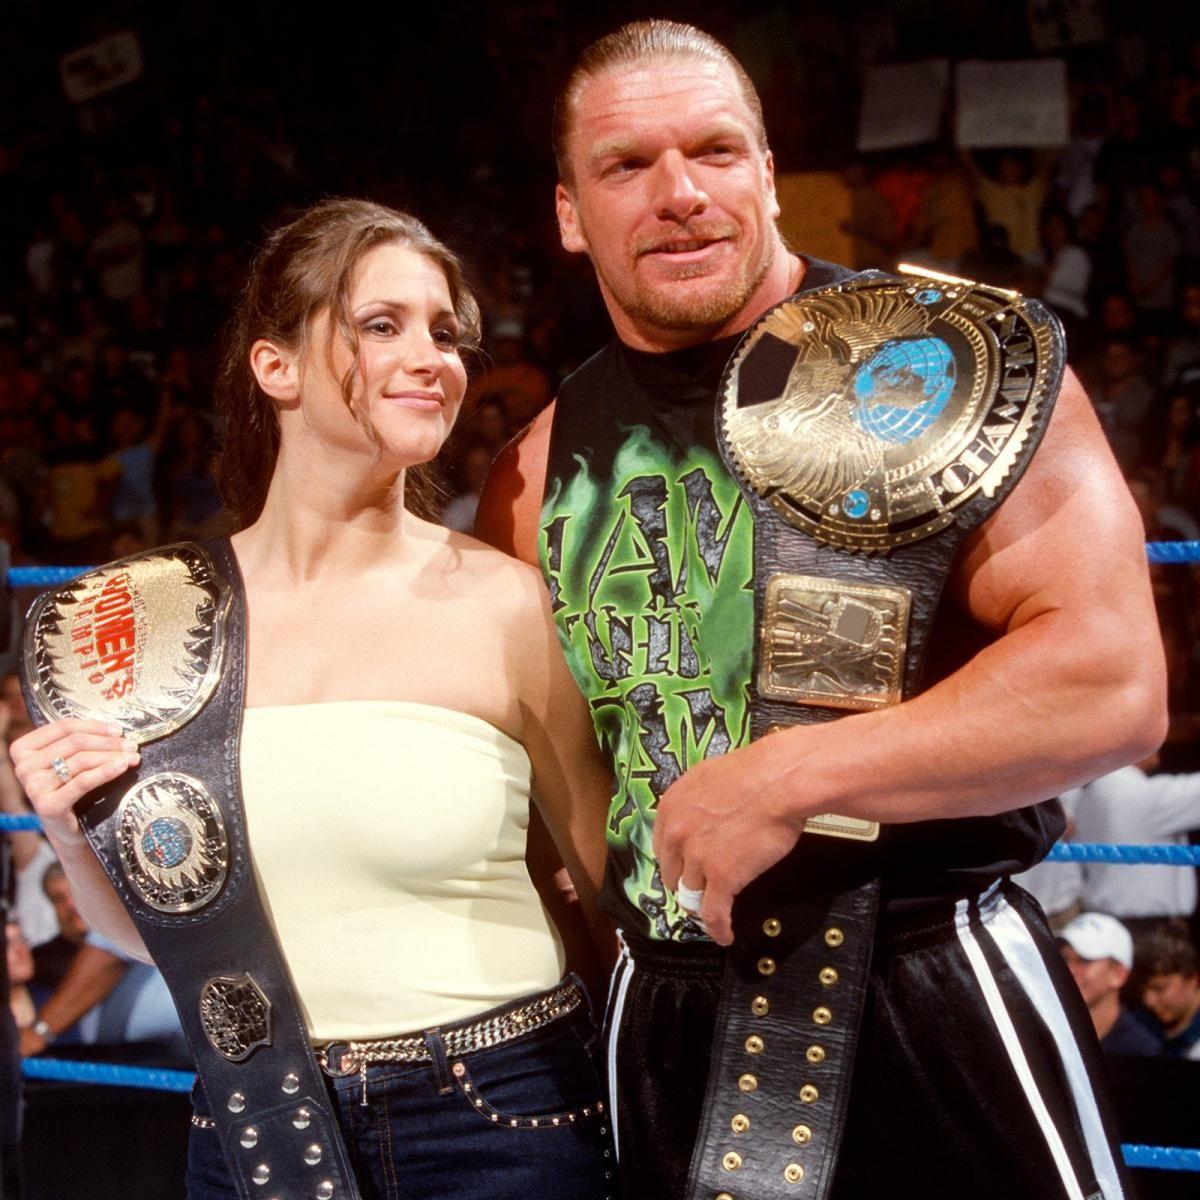 Triple H & Shawn Michaels | Wwe shawn michaels, Wrestling